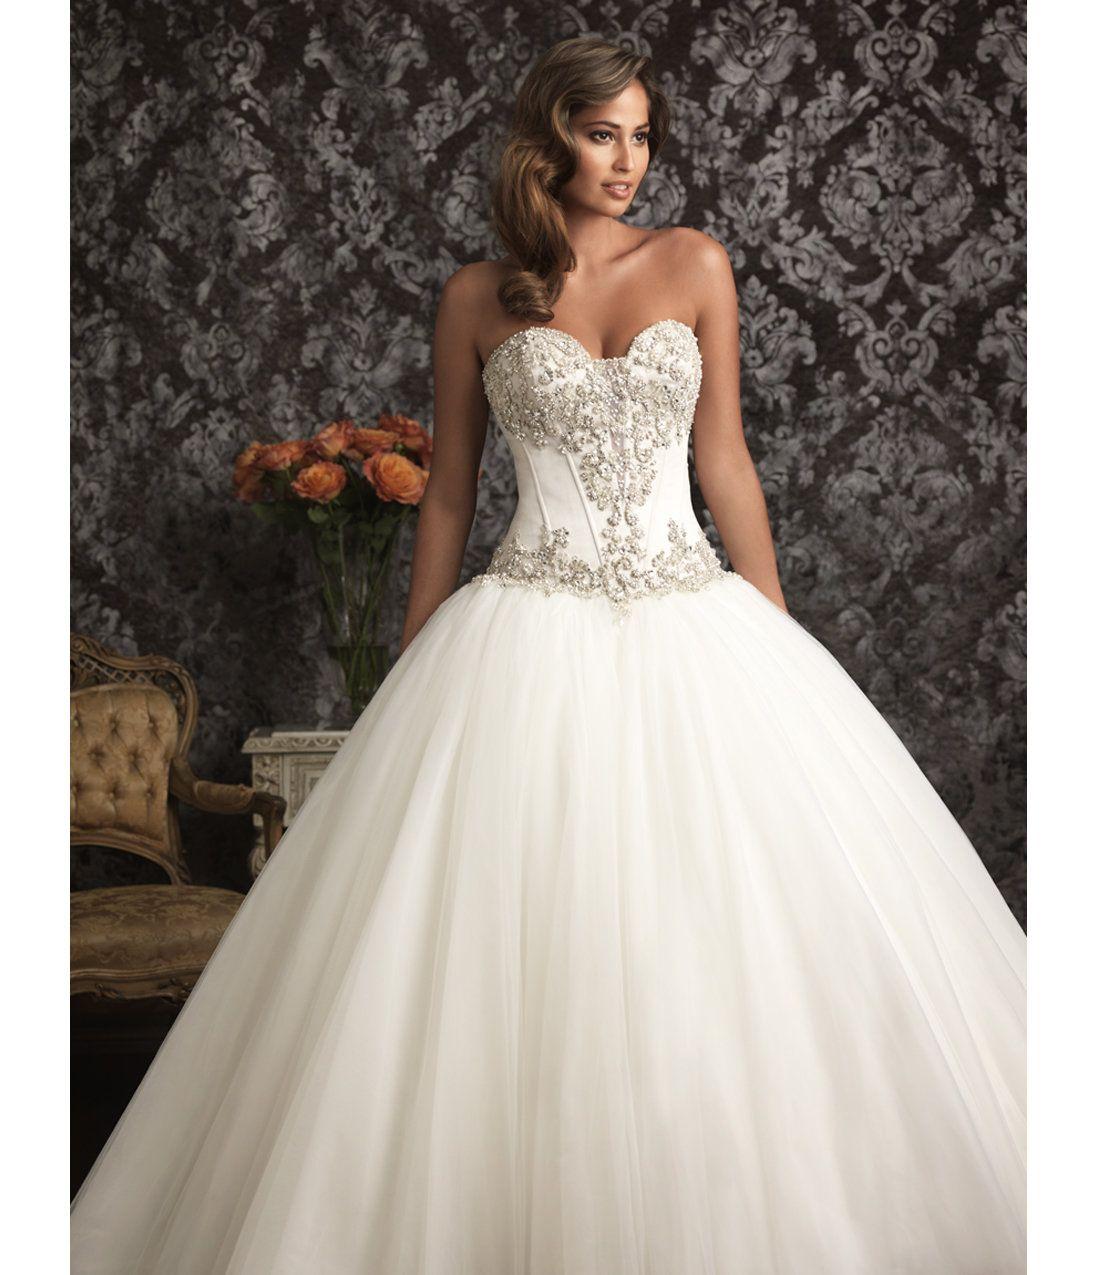 White puffy wedding dresses   Allure Bridal  White u Silver Satin u Organza Chapel Train